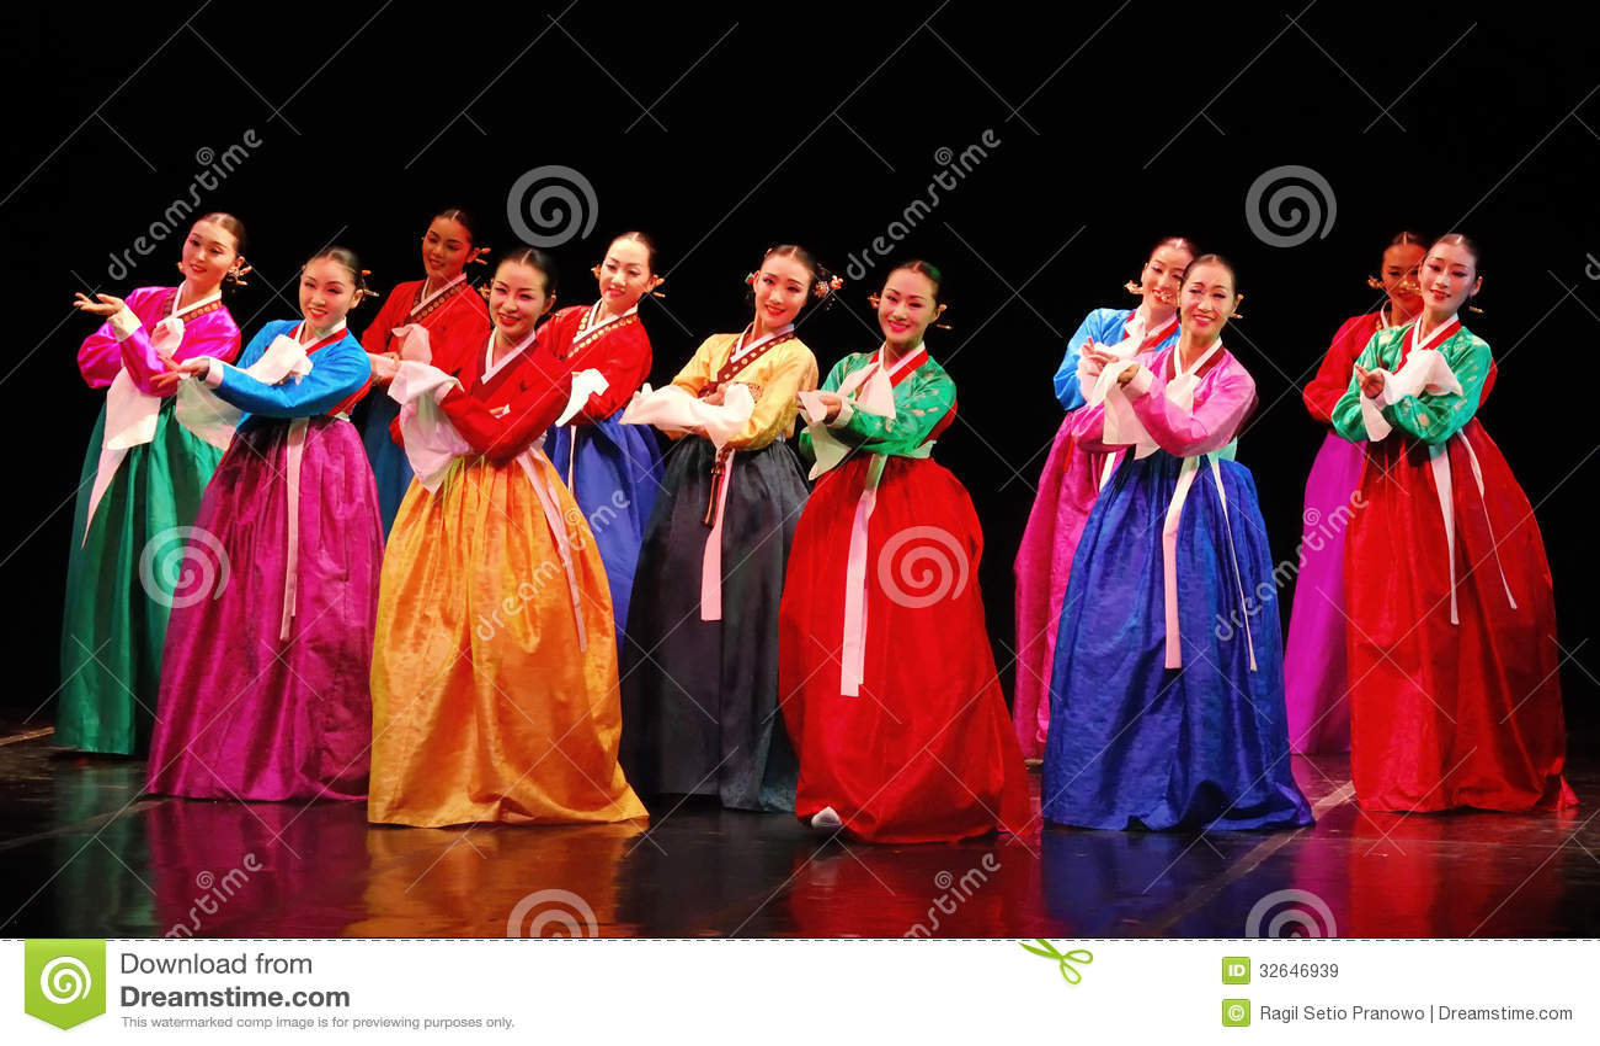 Performance Of Busan Korean Traditional Dance Editorial Stock Image  Image of entertain, busan